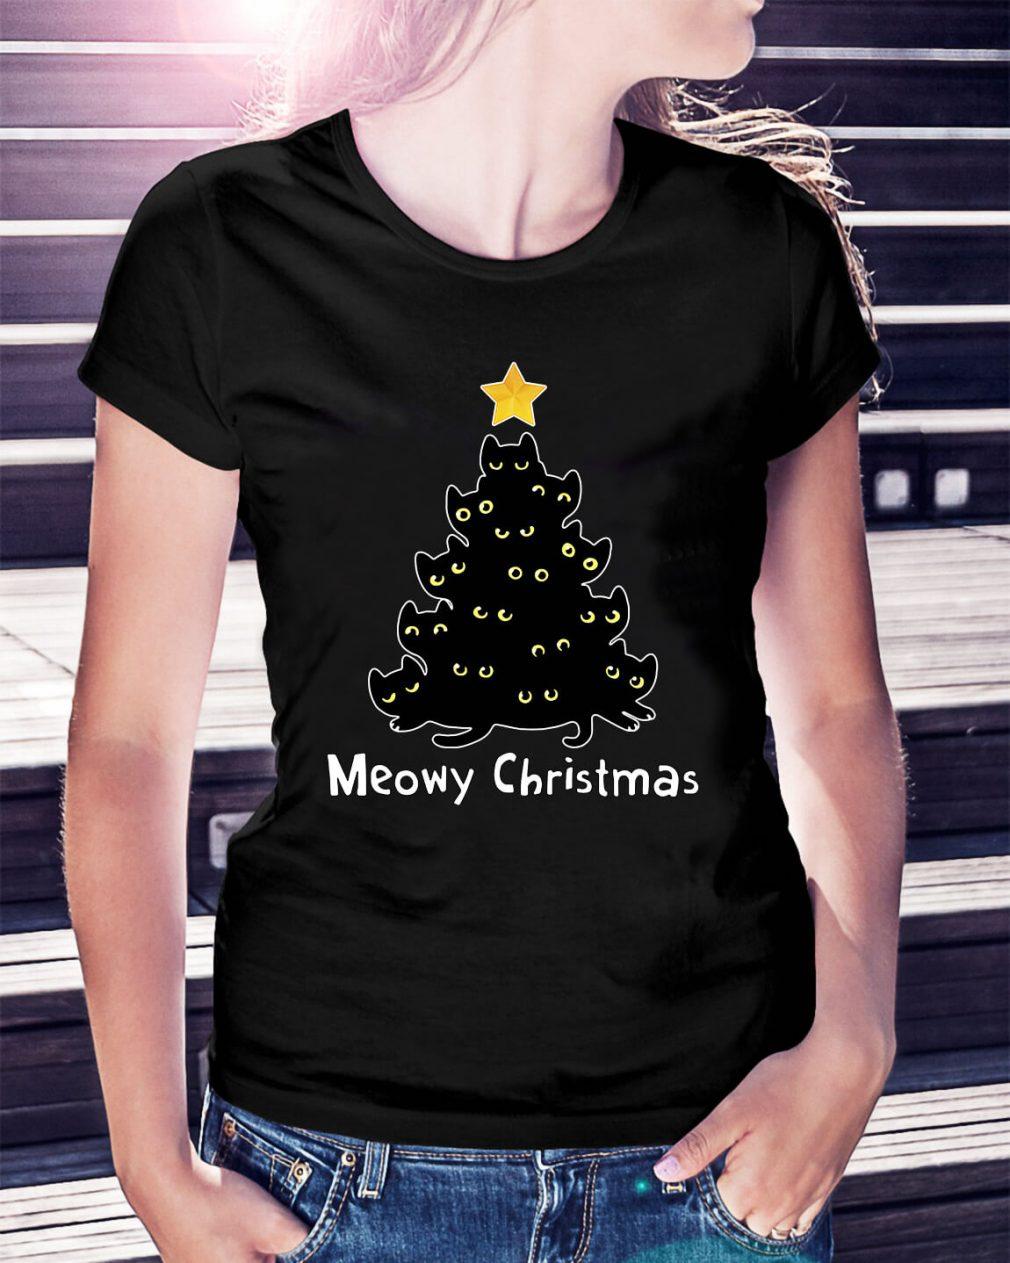 Meowy Christmas Ladies Tee